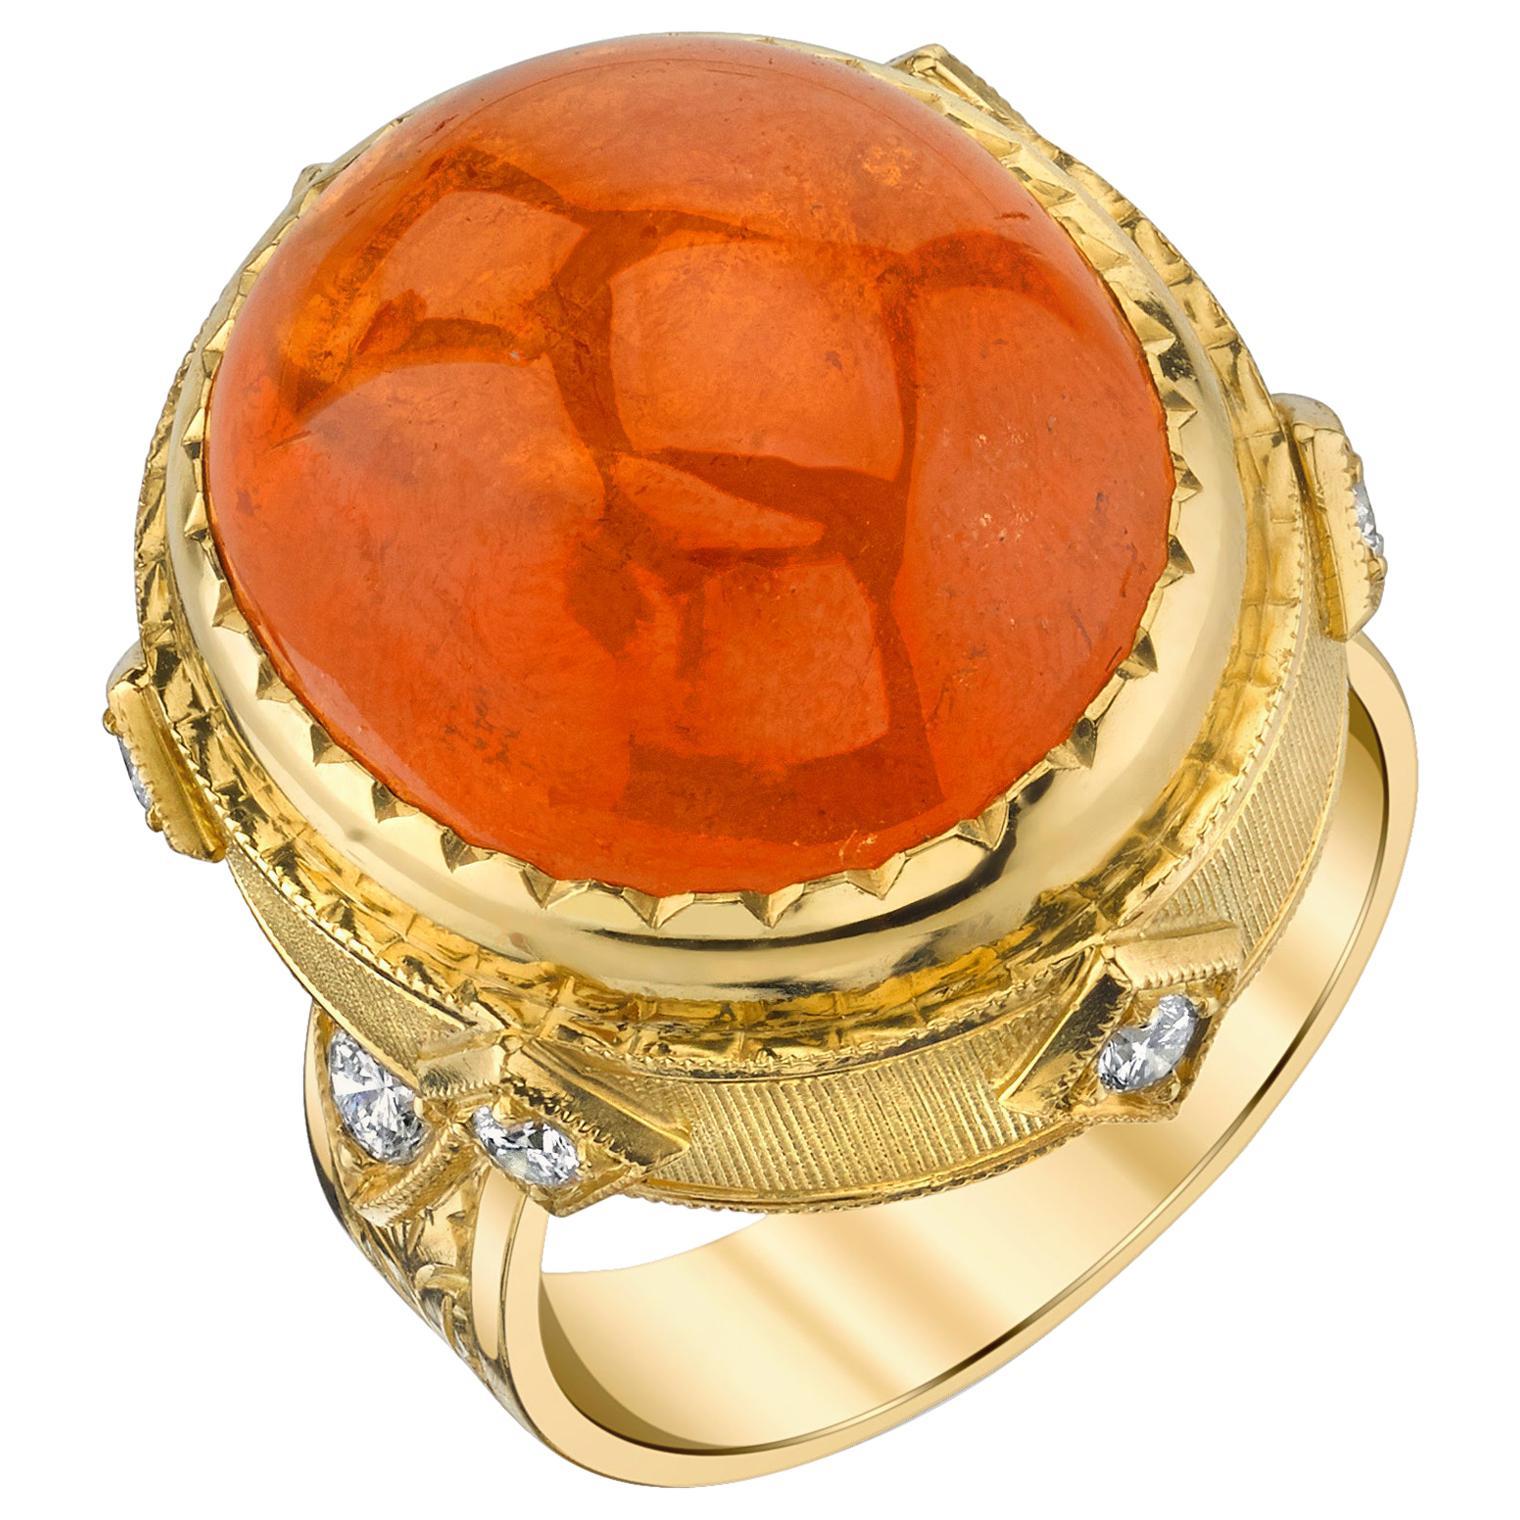 24.39 Carat Spessartite Garnet Cabochon, Diamond Yellow Gold Dome Cocktail Ring